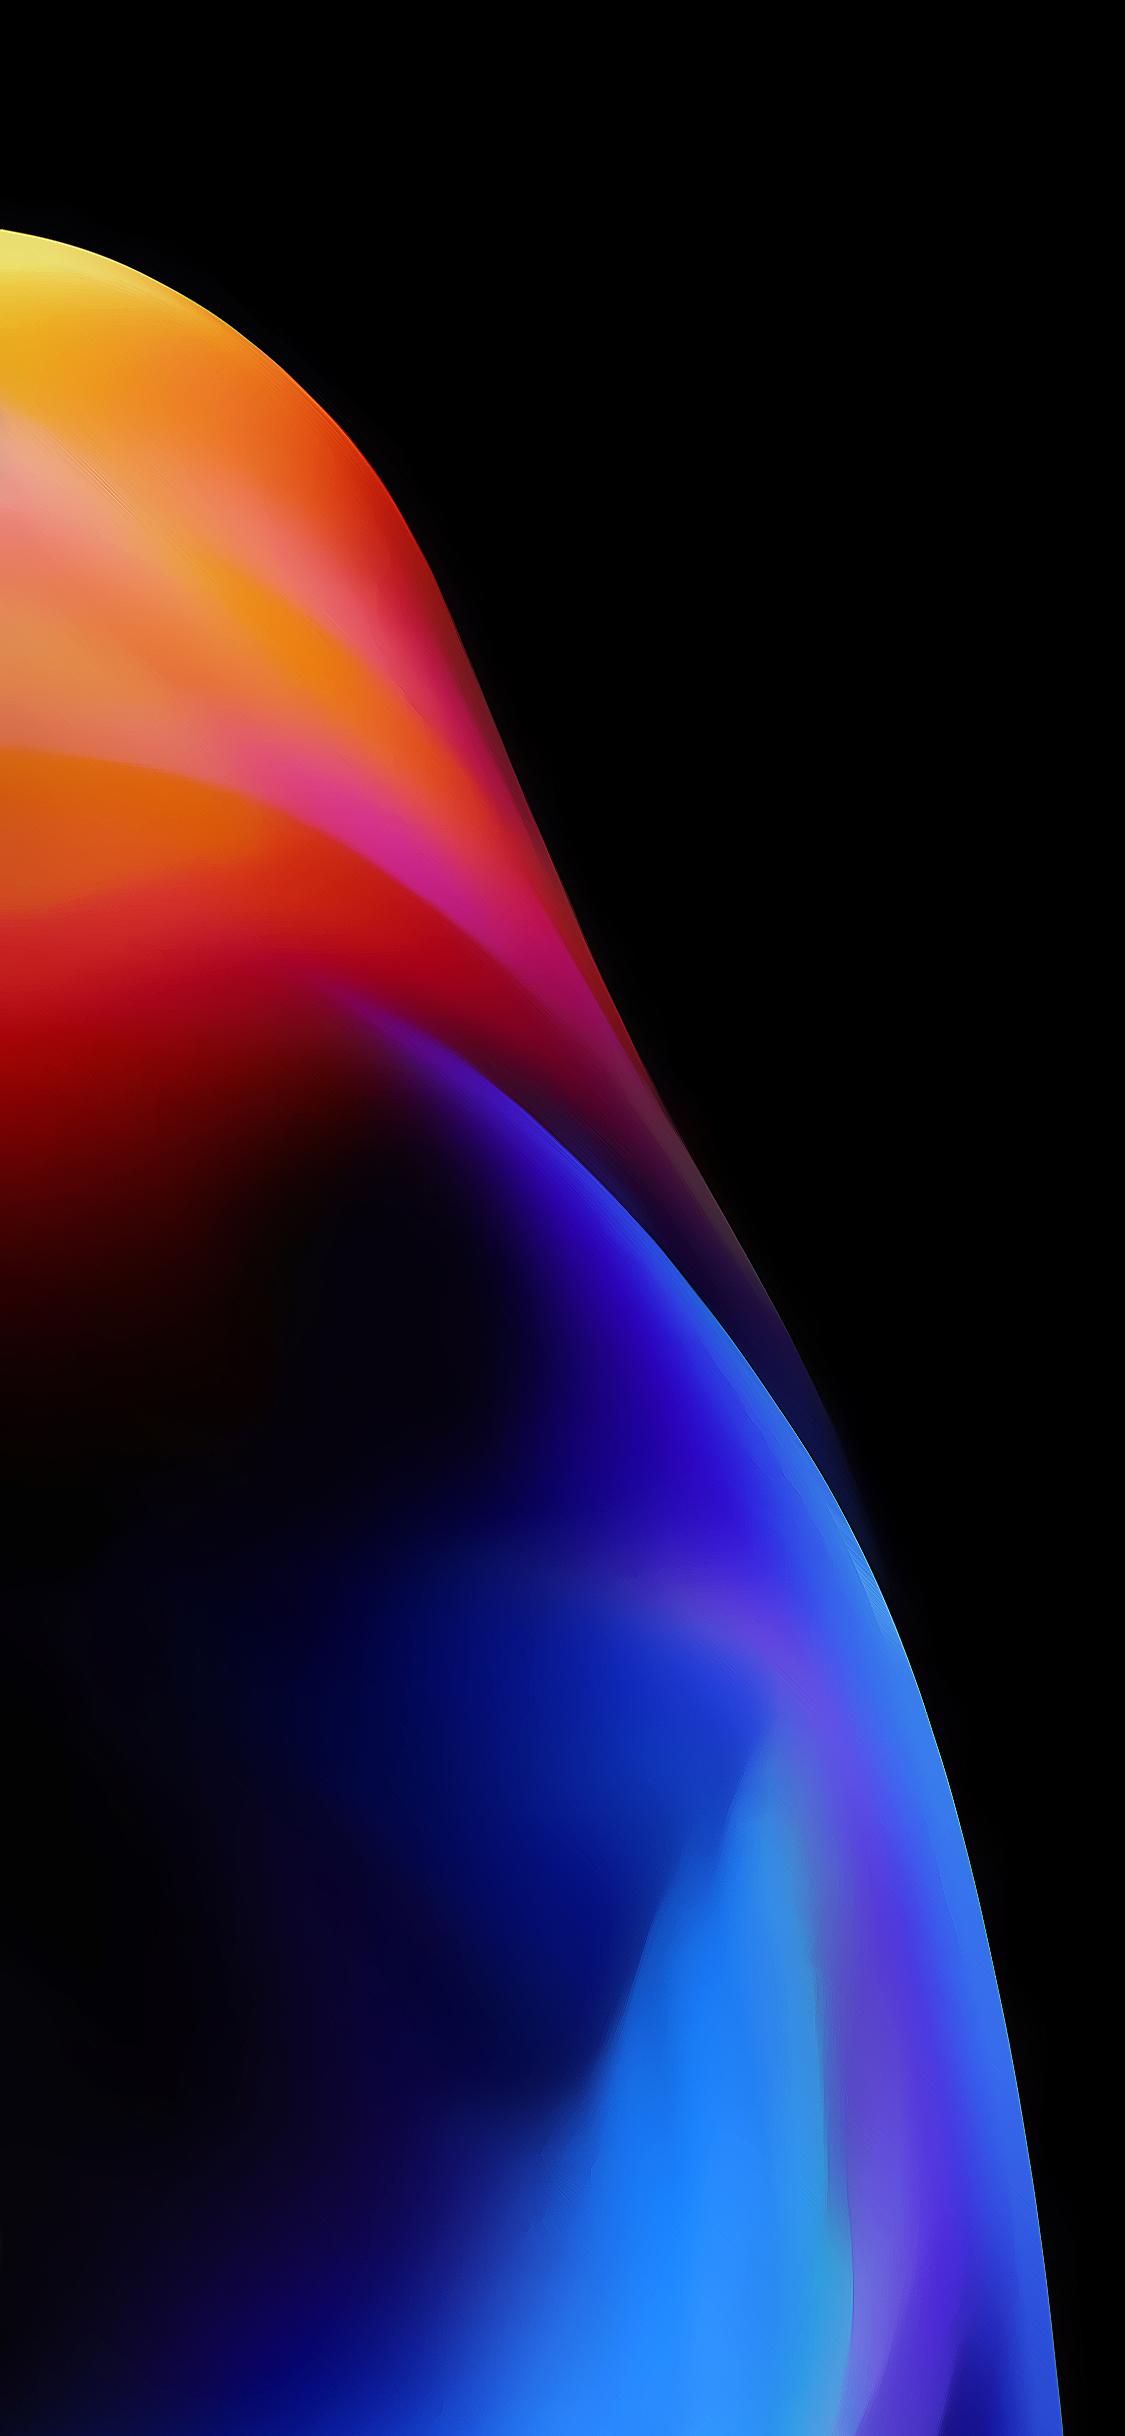 Iphone8 8 Plusのredモデル公式イメージの壁紙が公開 Iphone Mania